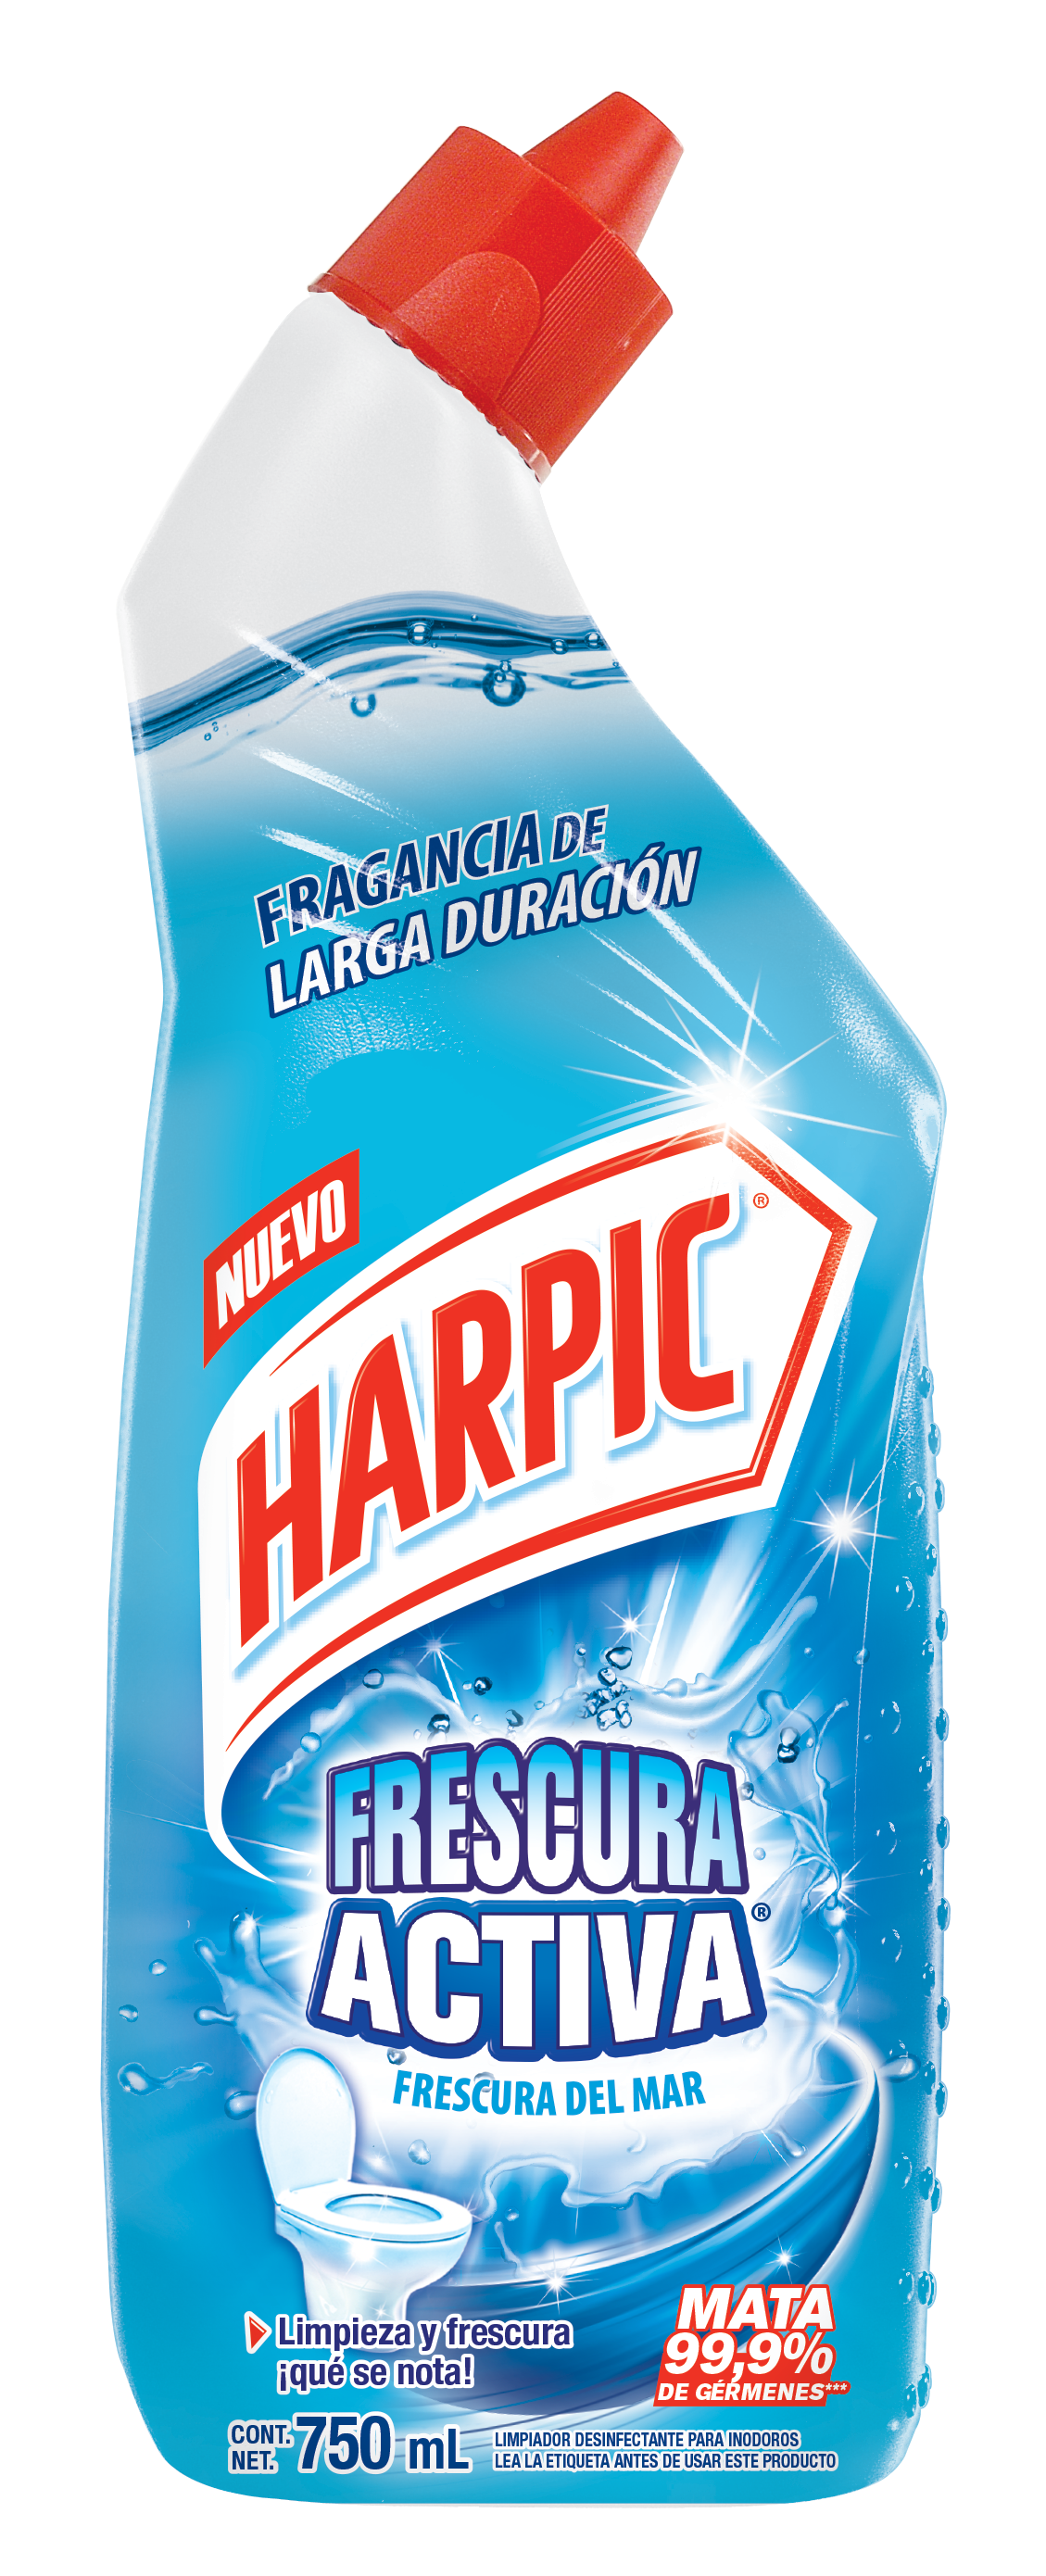 Harpic® Frescura Activa Frescura Marina, 750ml